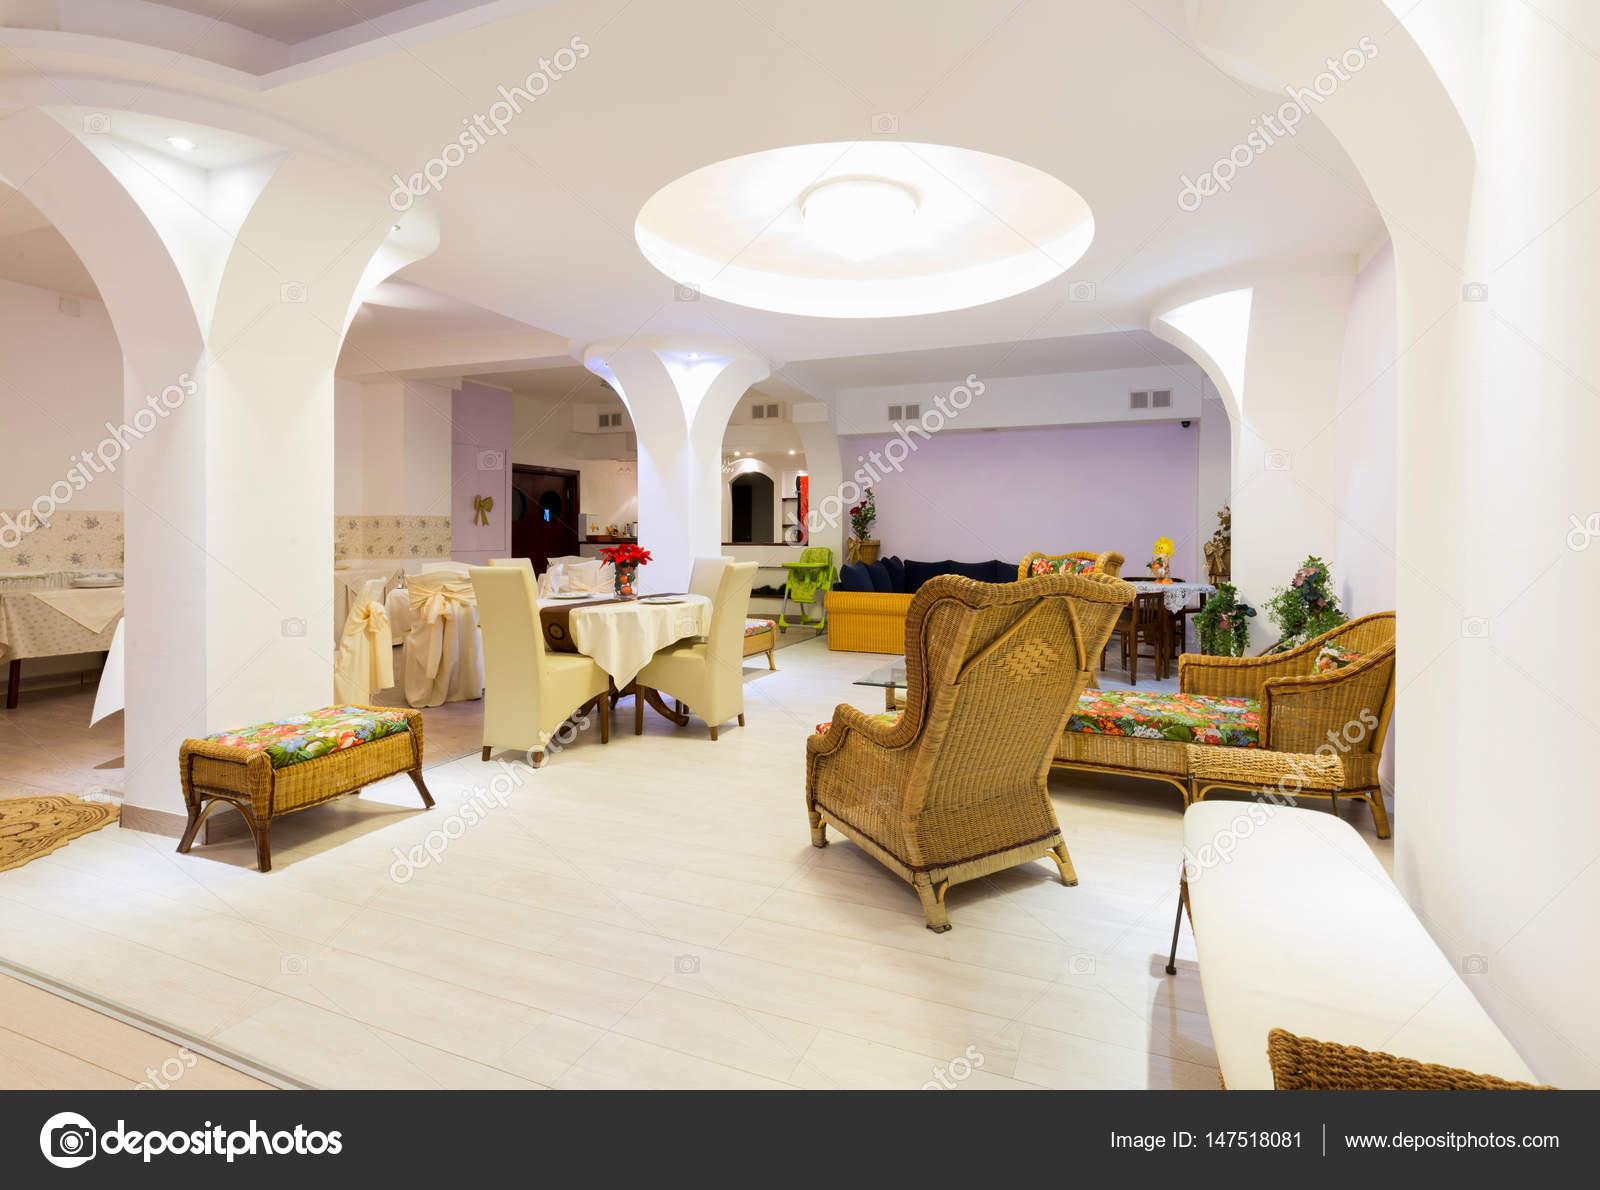 Rilueda 147518081 for Design hotel lizum 1600